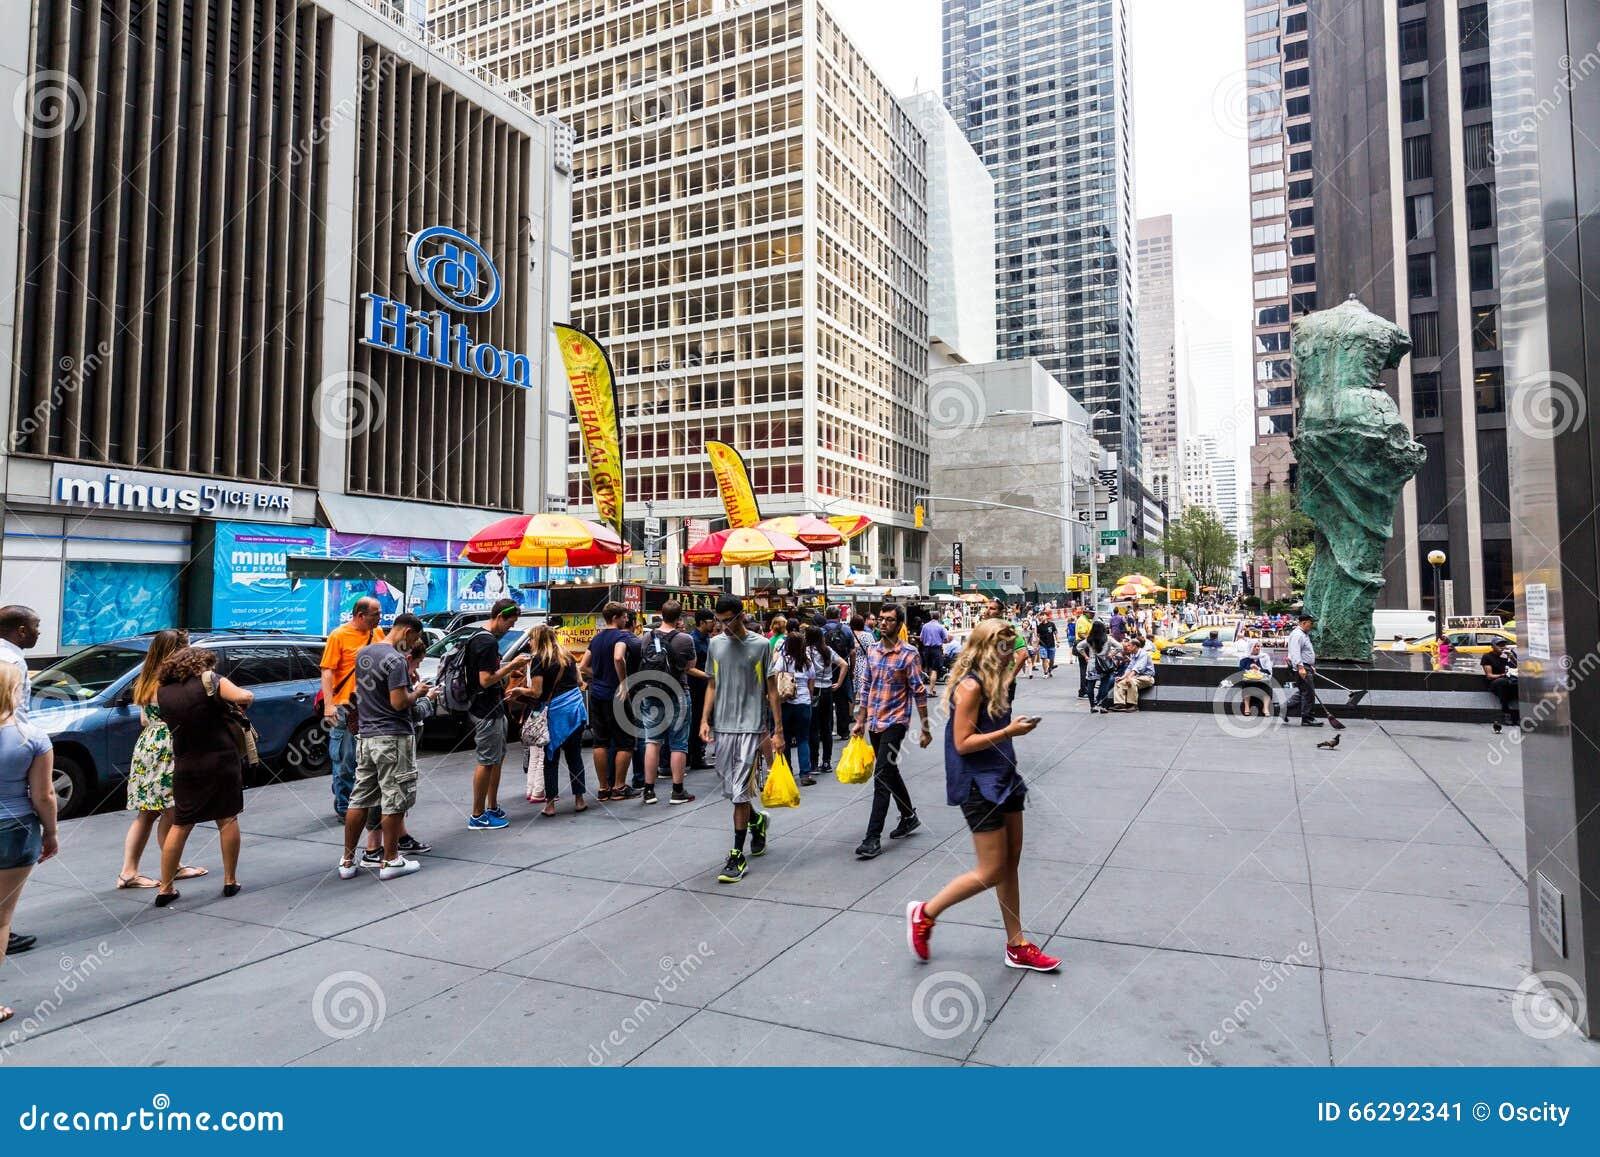 Famous New York Halal Food Vendor In Midtown Manhattan ...